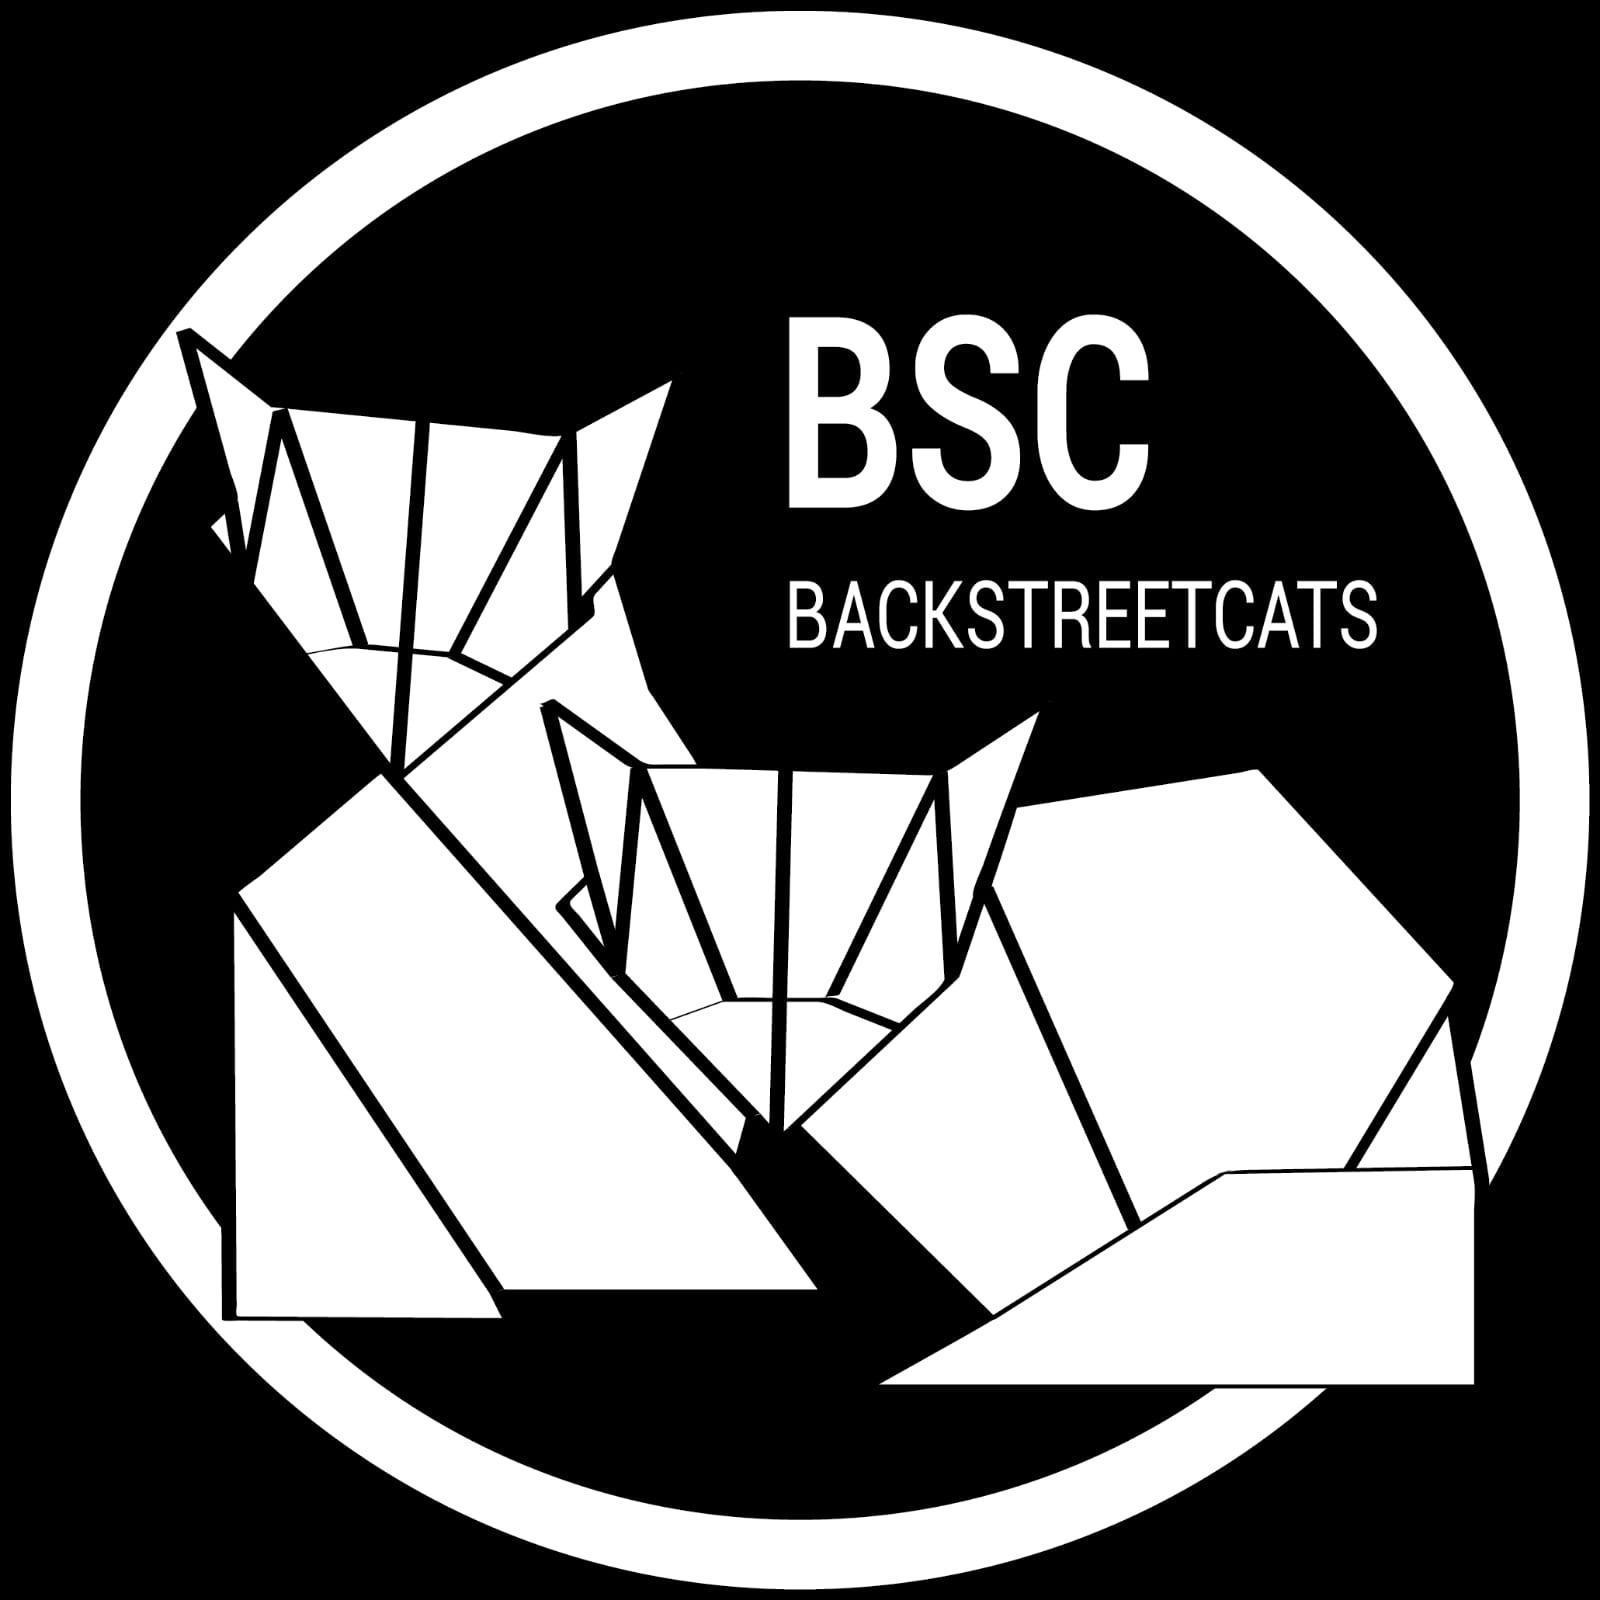 BackStreet Cats